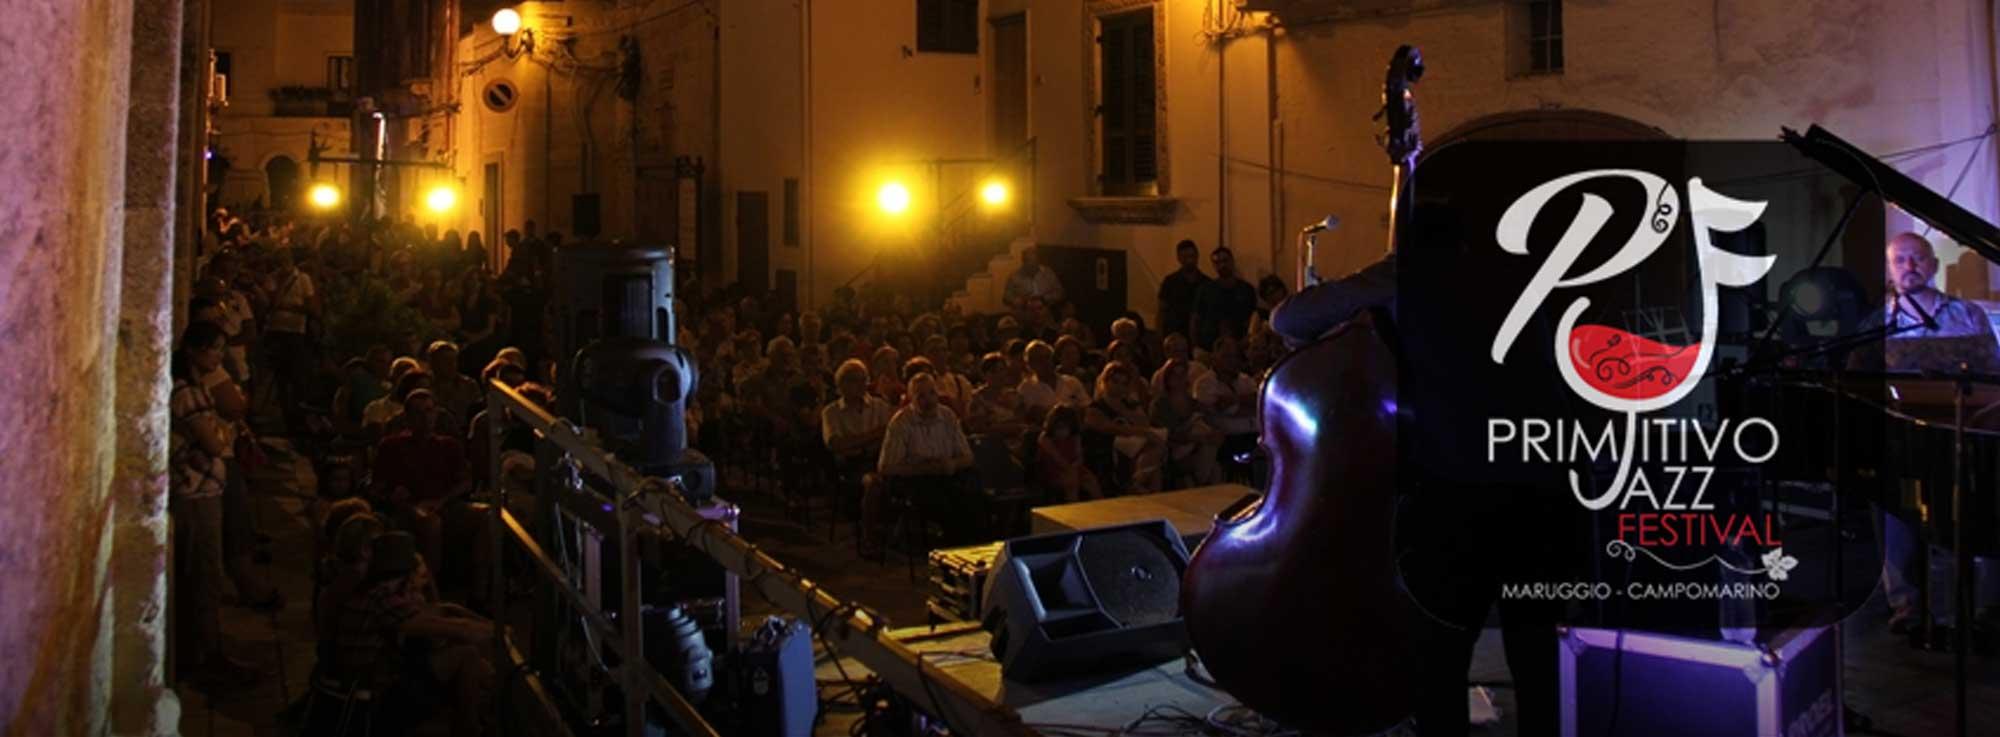 Maruggio: Primitivo Jazz Festival